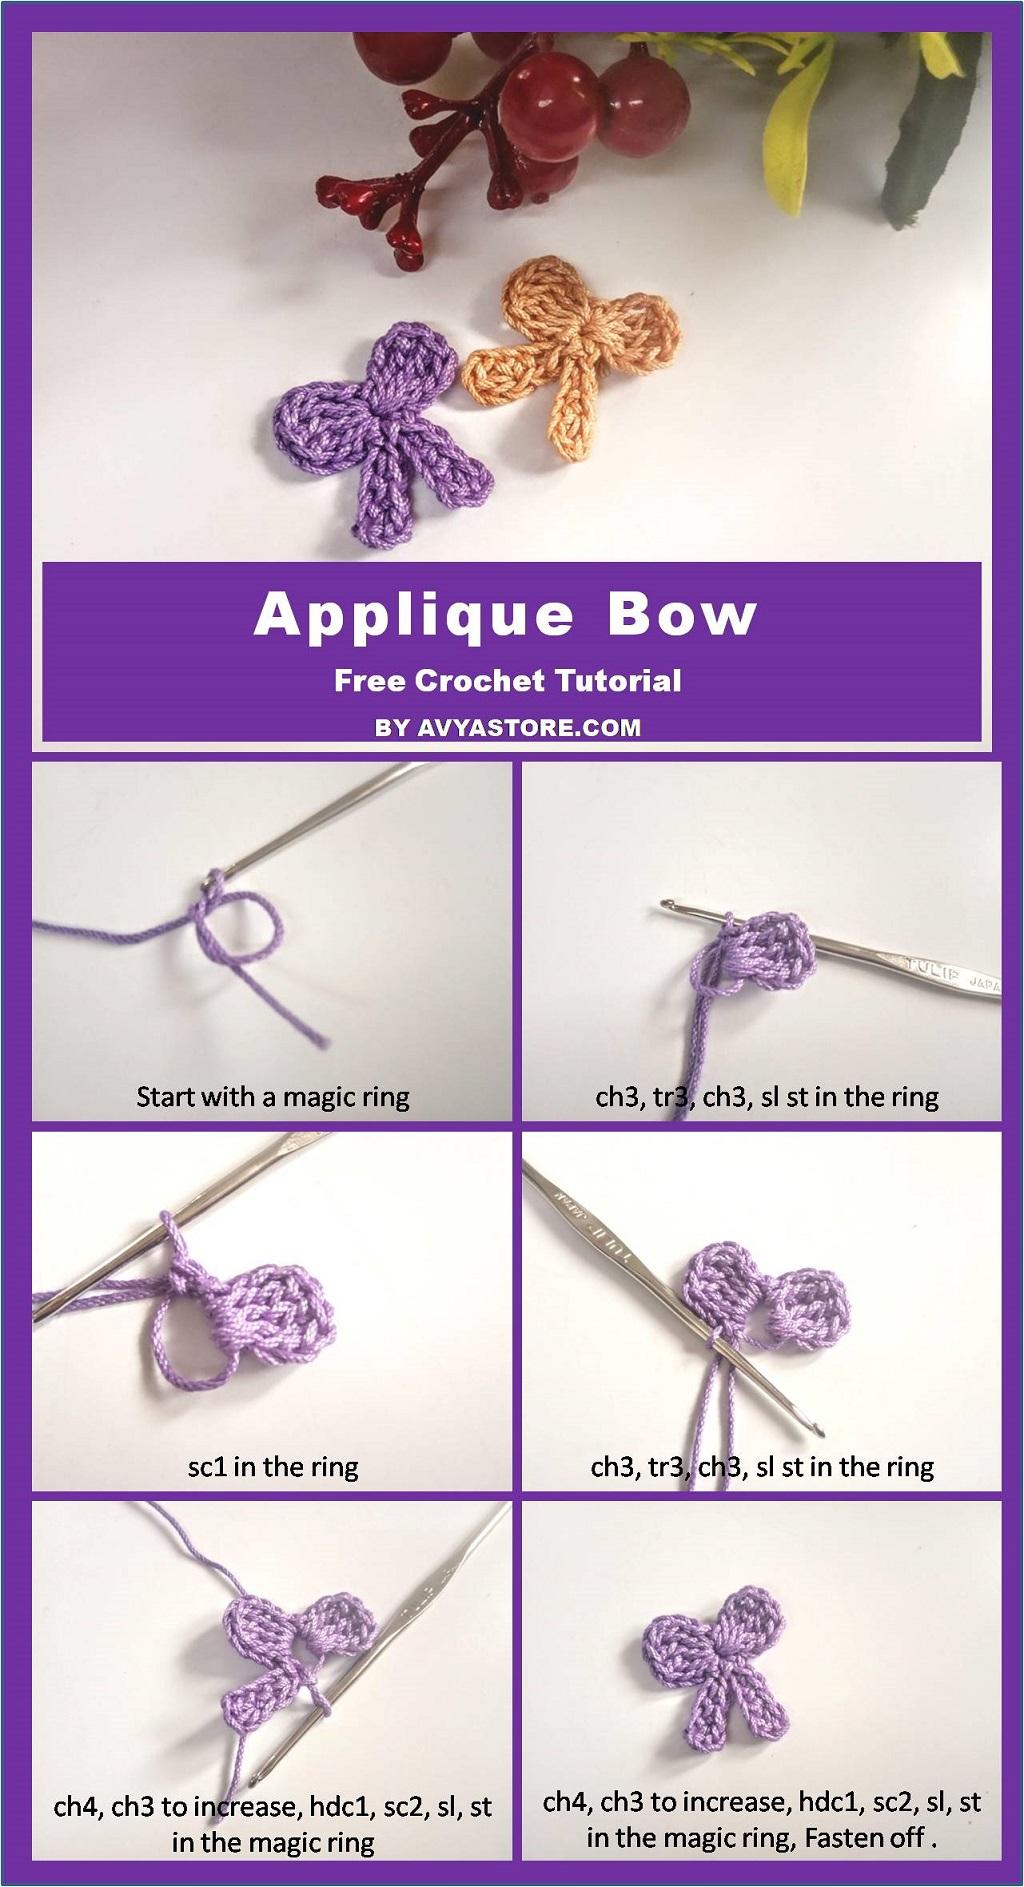 Applique Bow – Free Crochet Tutorial